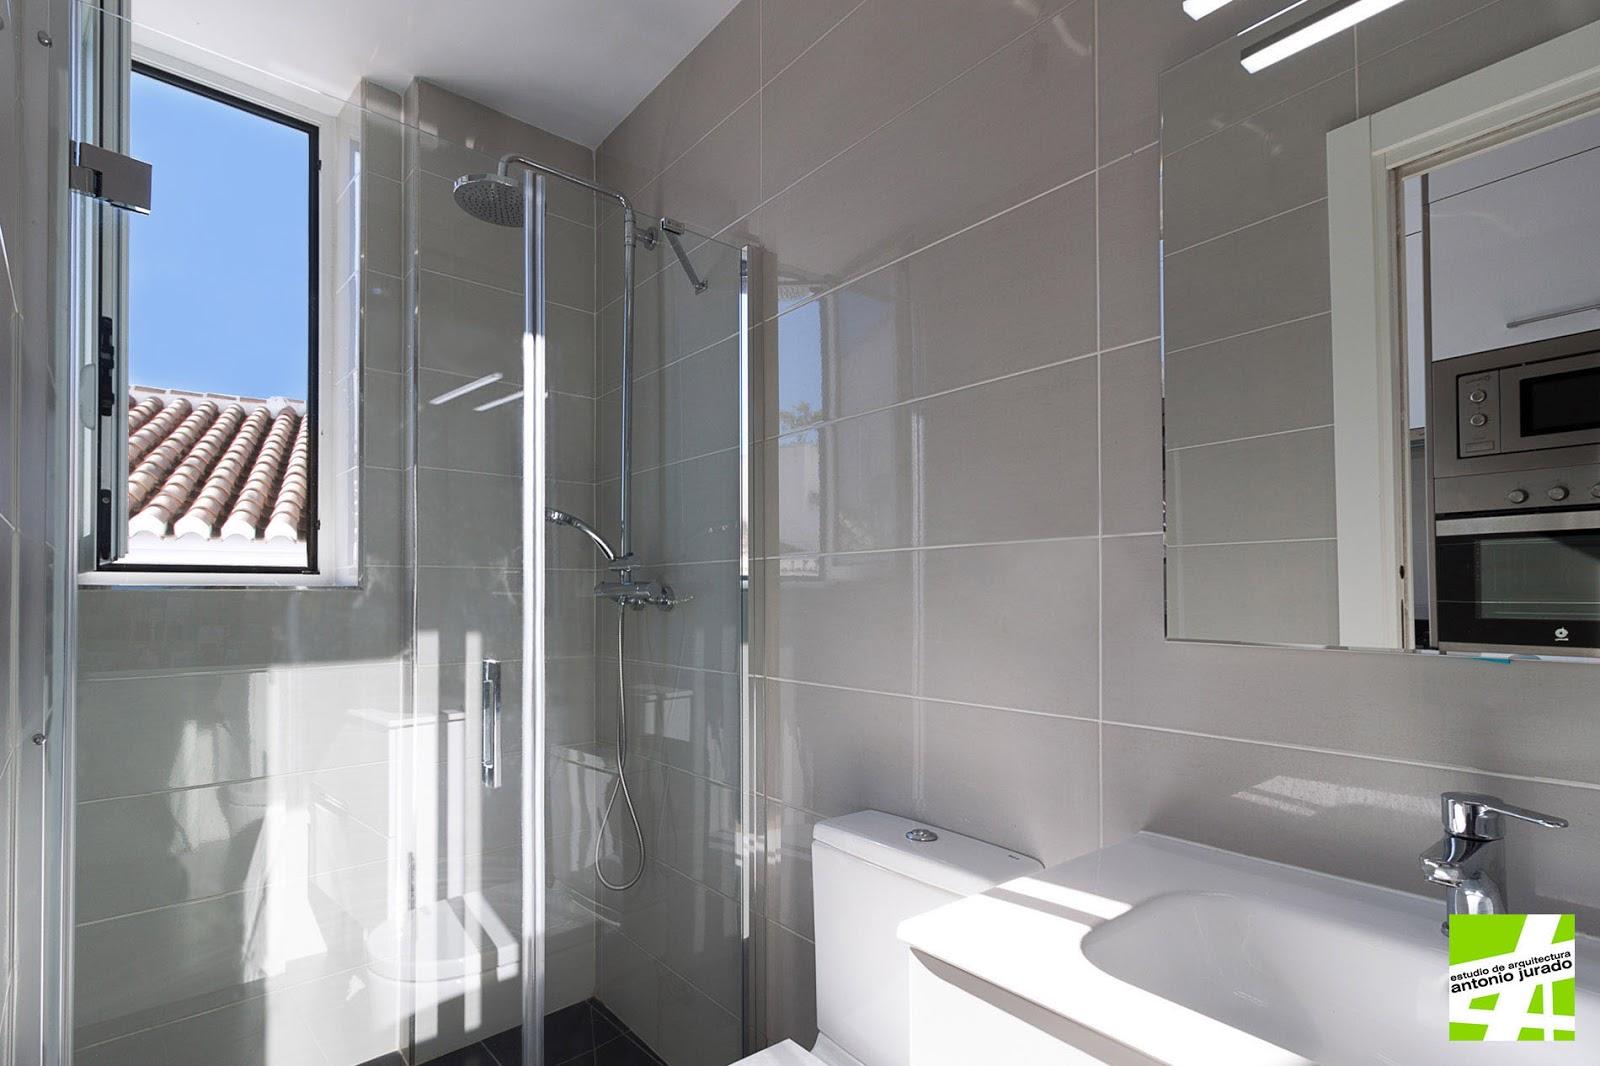 casa-sc-torrox-reforma-ampliacion-vivienda-antonio-jurado-arquitecto-torrox-malaga-04